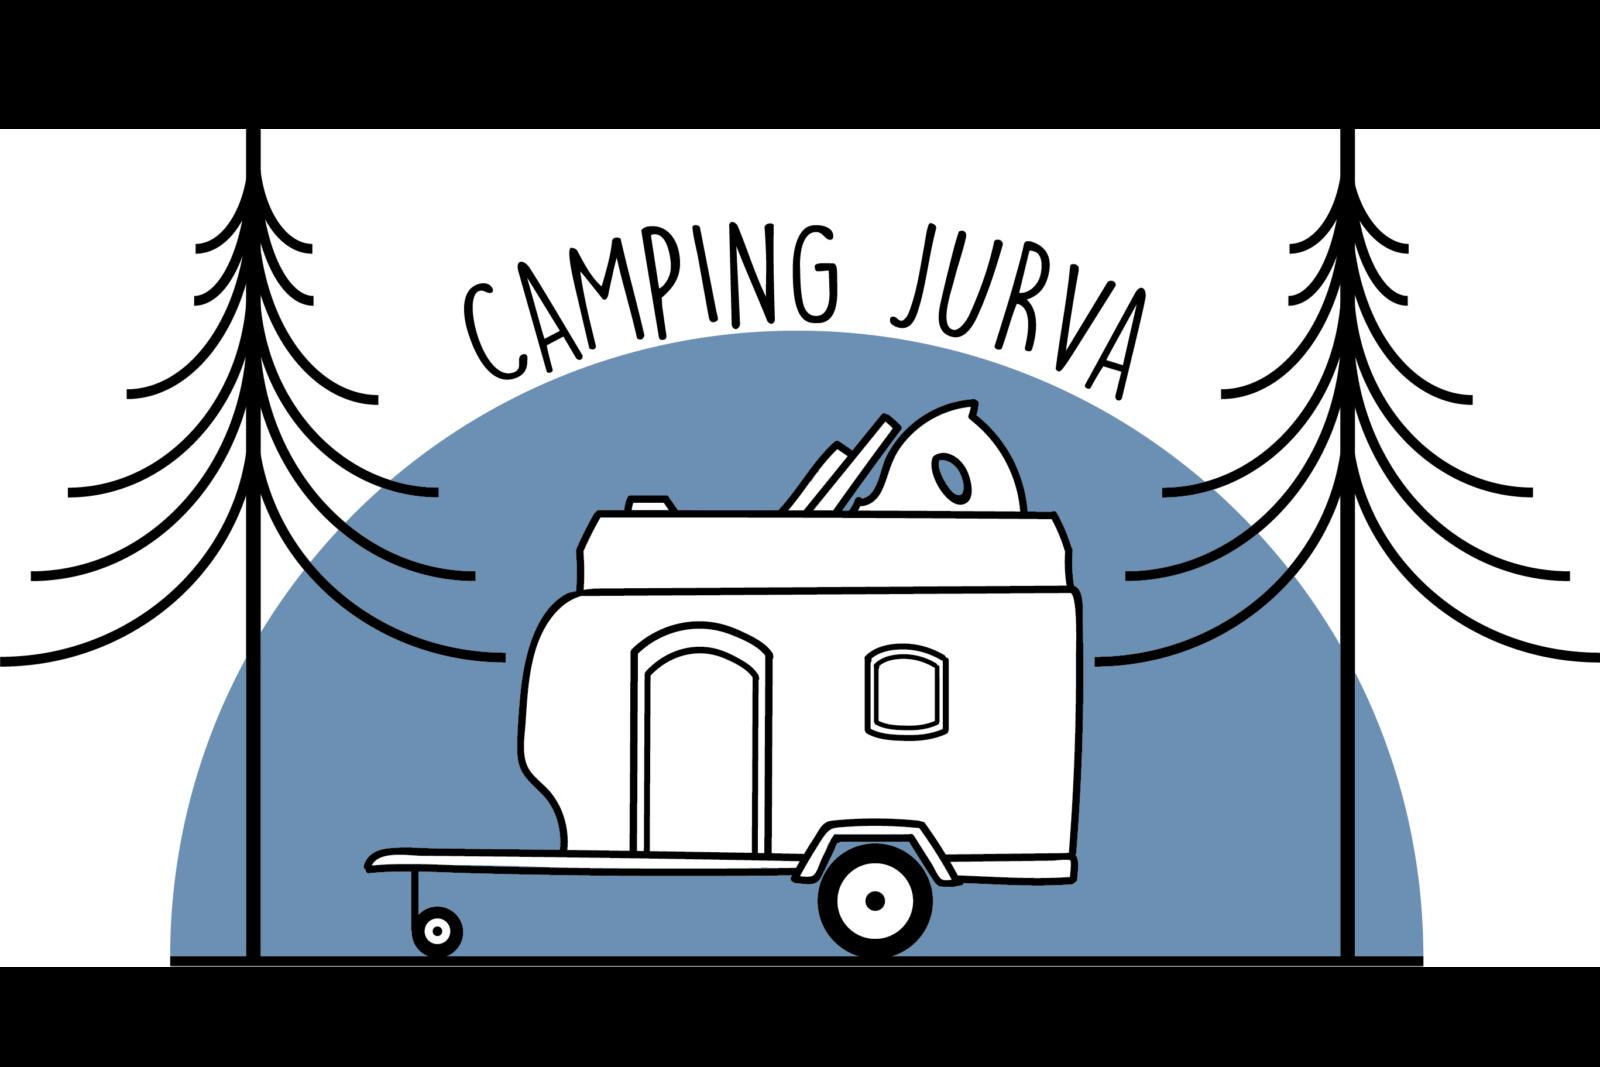 Camping Jurvan logo.